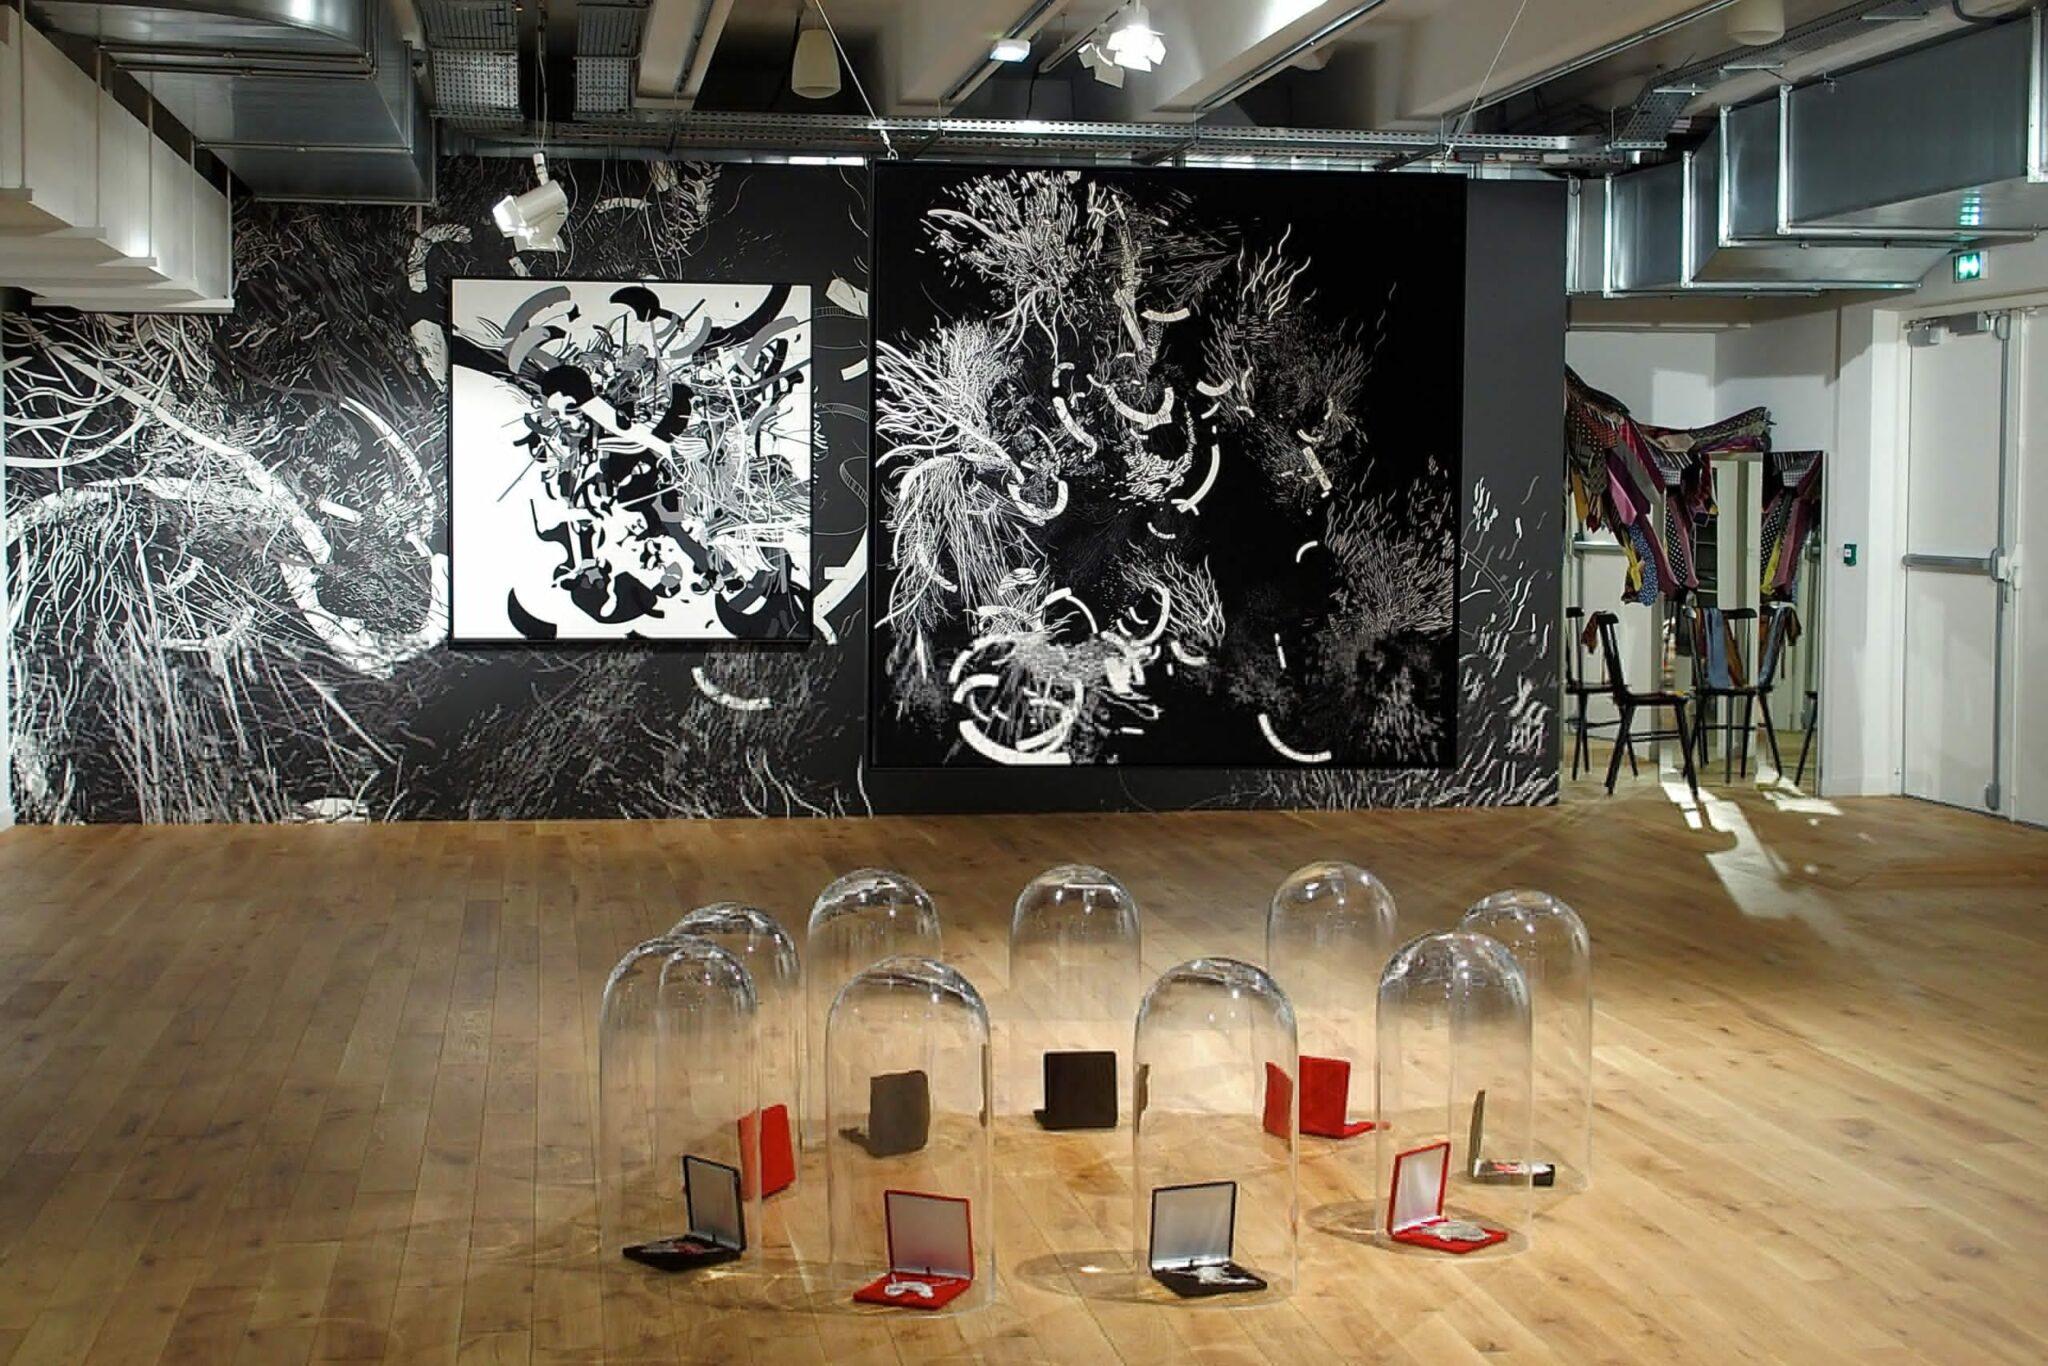 audrey-hatchikian-gallery-flagrant-délire-sacha-haillote-rodolphe-barsikian-expo-art-contemporain-5